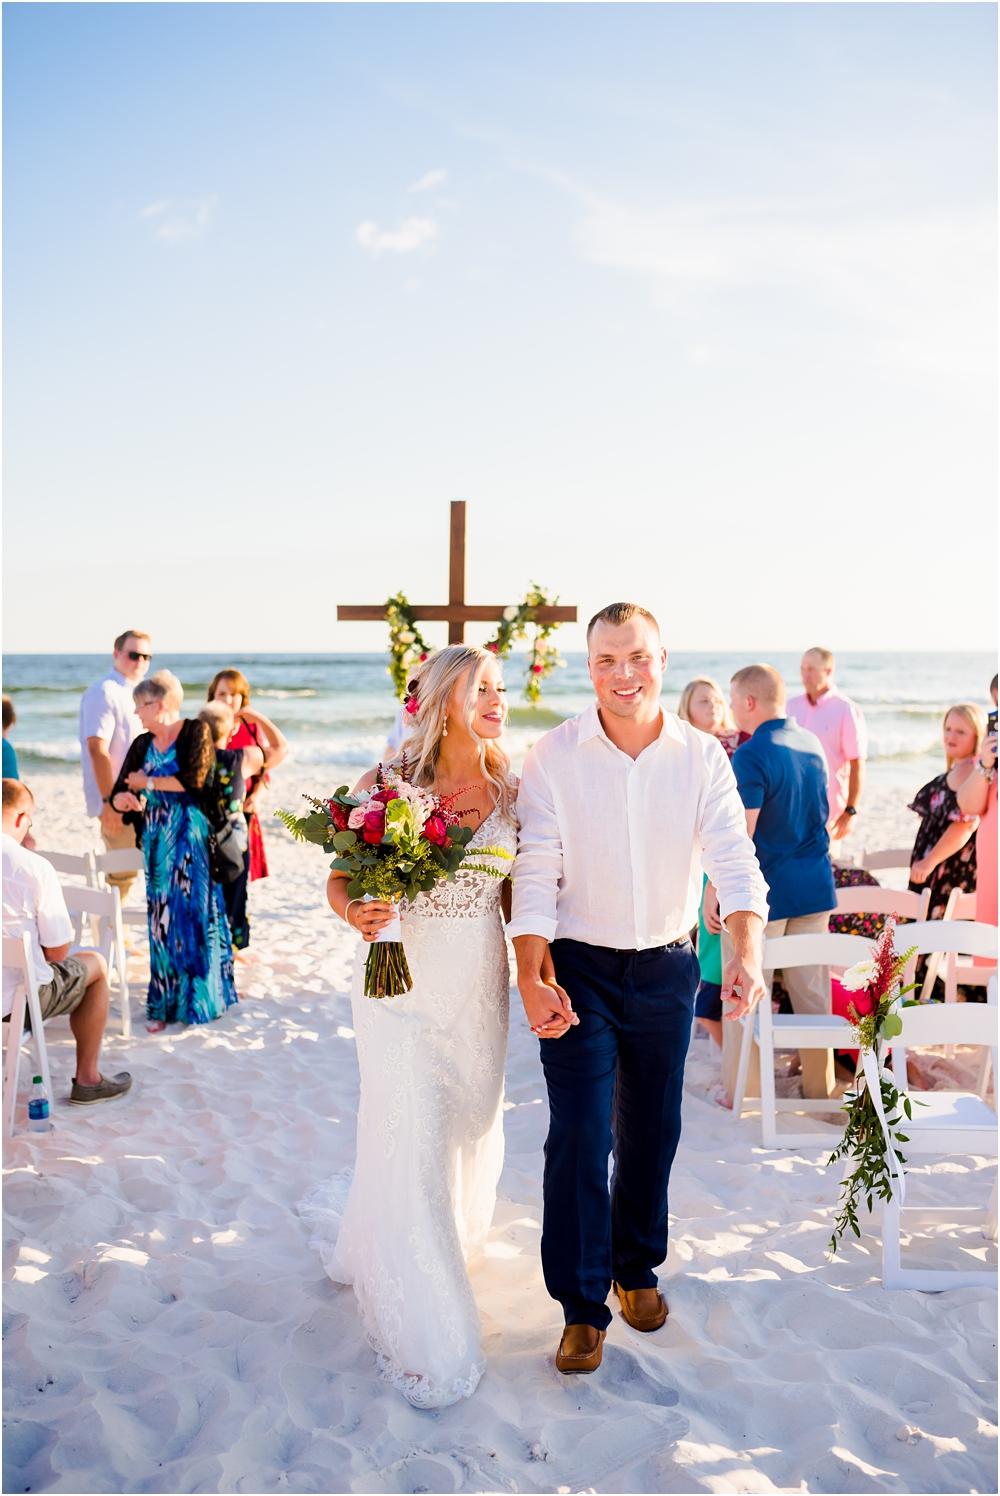 mcglothlin-wedding-kiersten-stevenson-photography-30a-panama-city-beach-dothan-tallahassee-(92-of-145).jpg